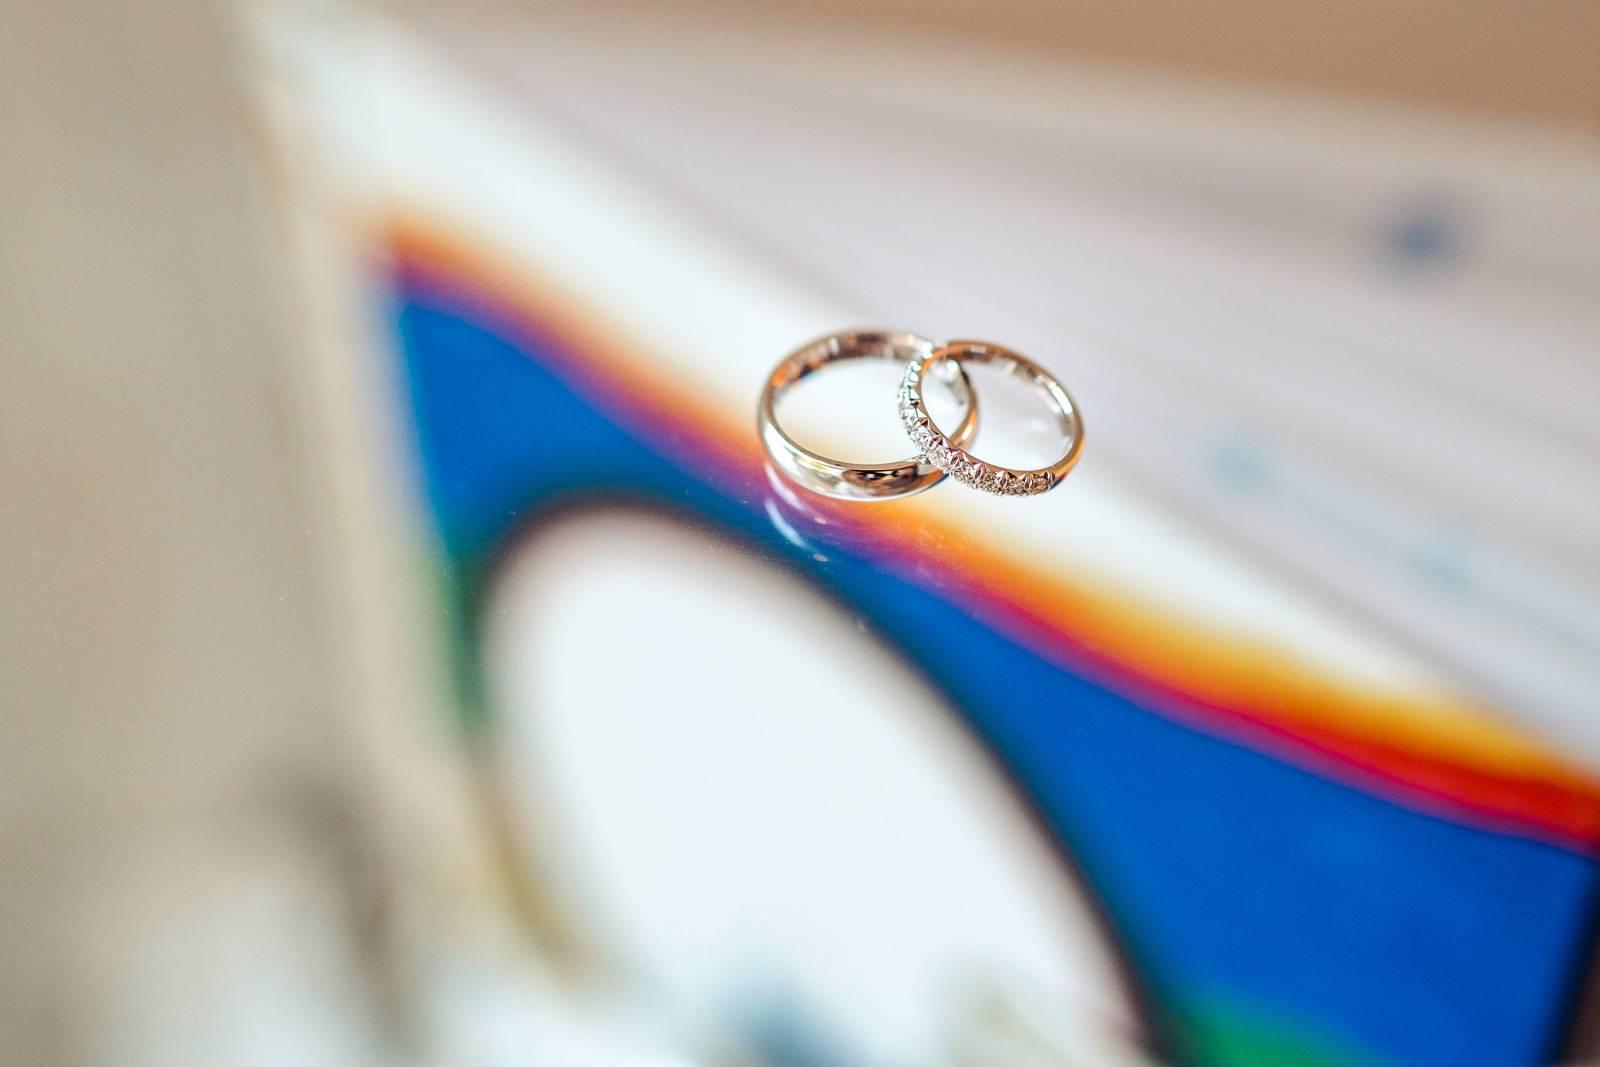 Juwelen Vanquaethem - JCD Photography - House of Weddings (15)